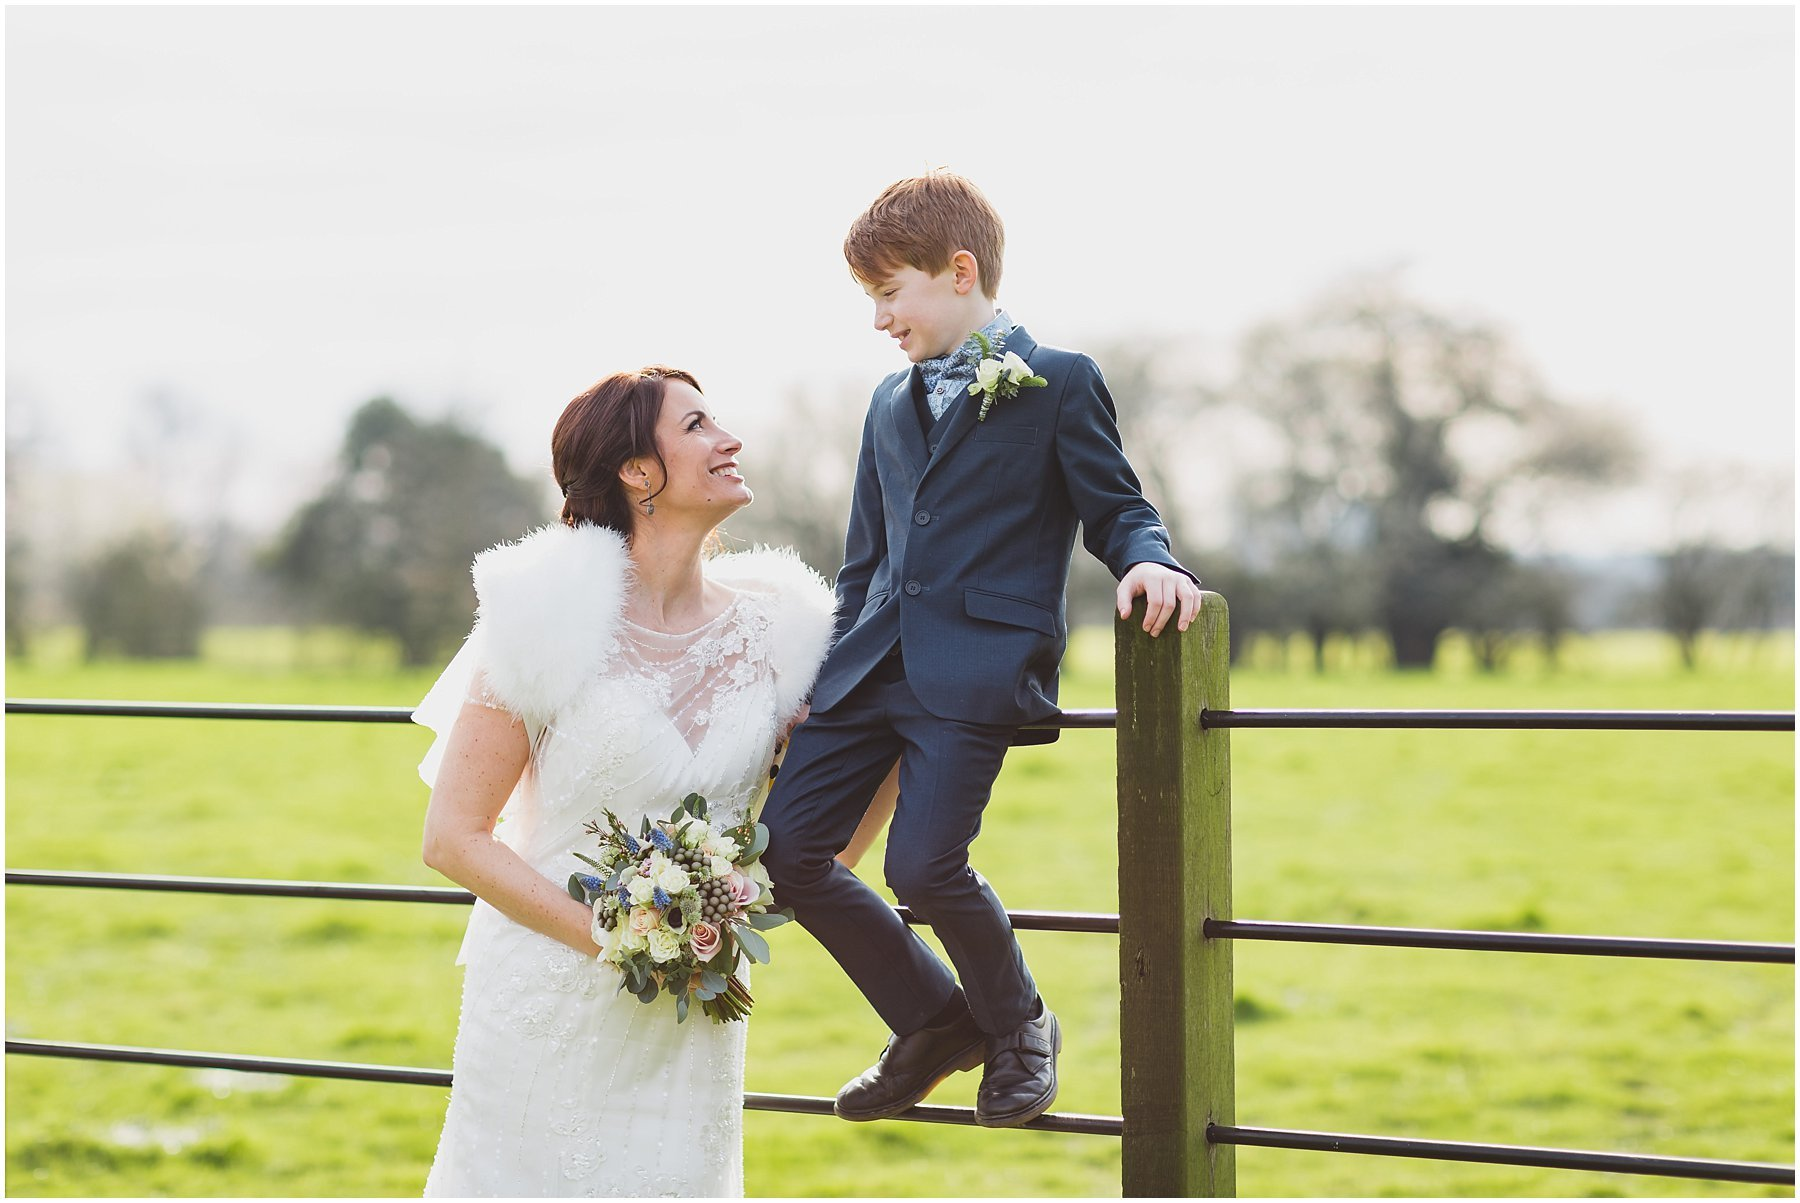 SARAH AND IAN SOUTHWOOD HALL WEDDING - NORFOLK WEDDING PHOTOGRAPHER 6